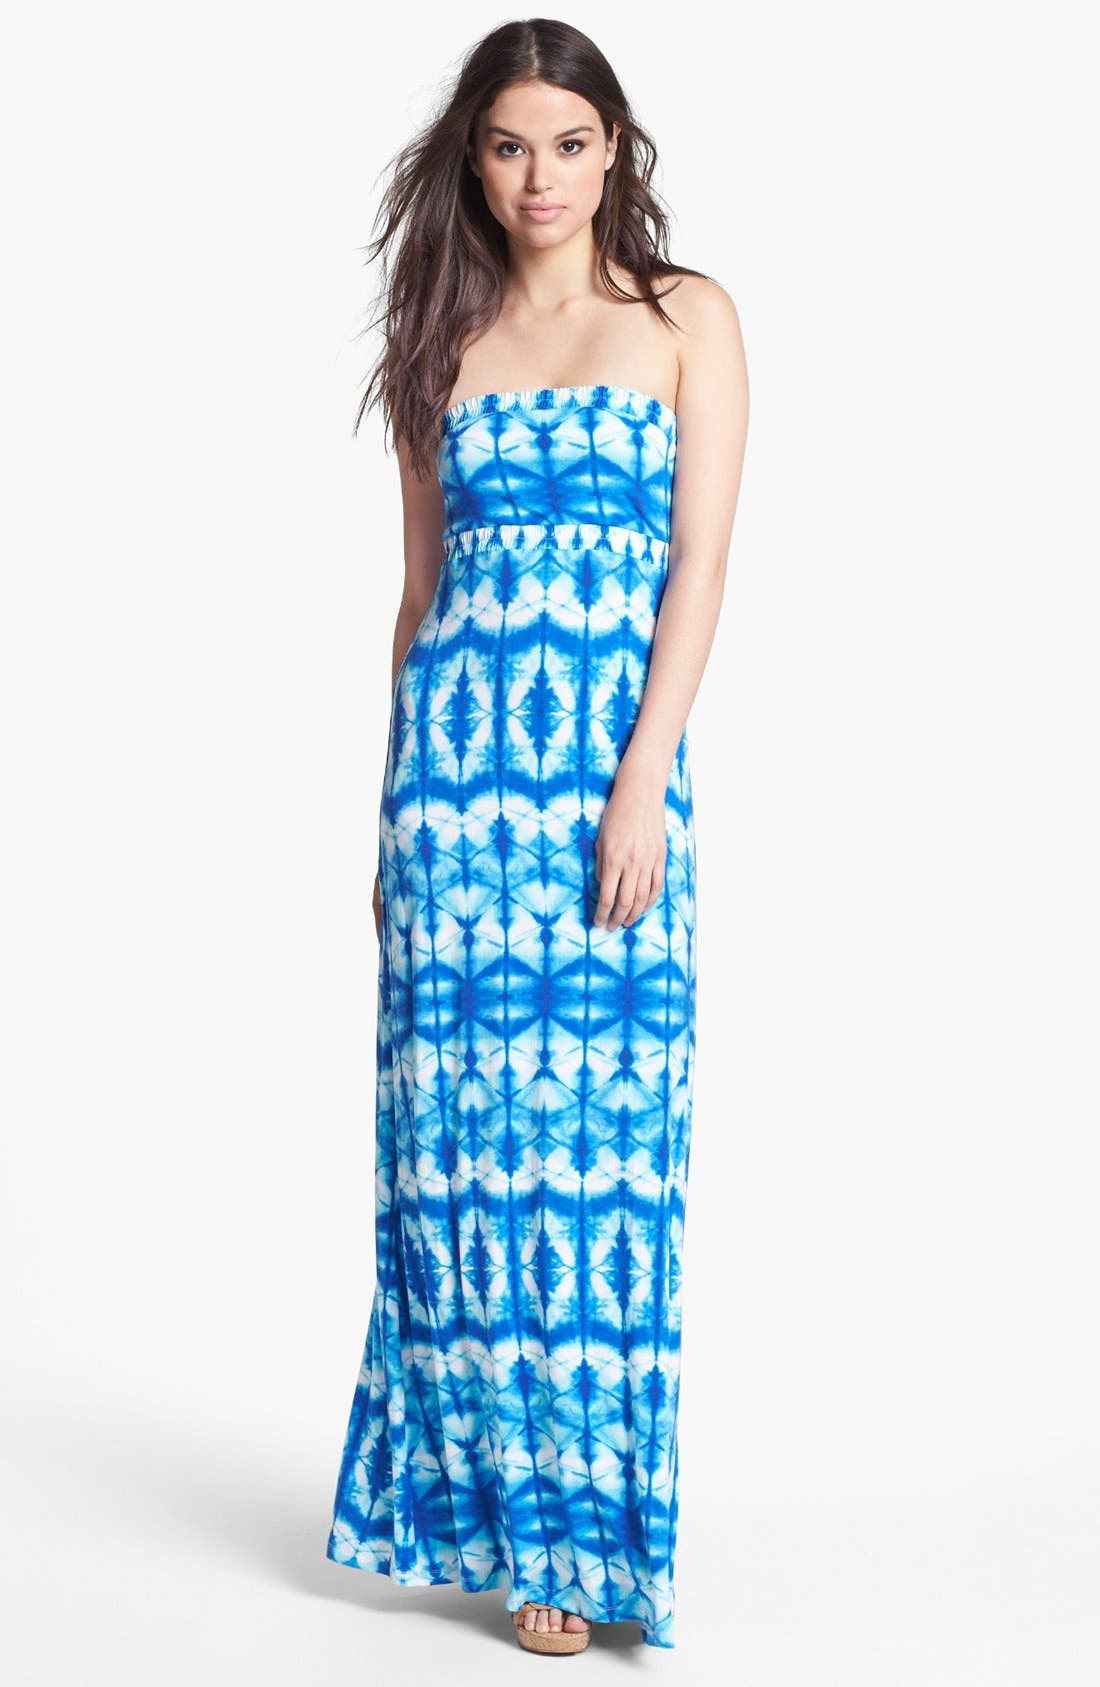 Alternate Image 1 Selected - Tart Strapless Print Maxi Dress